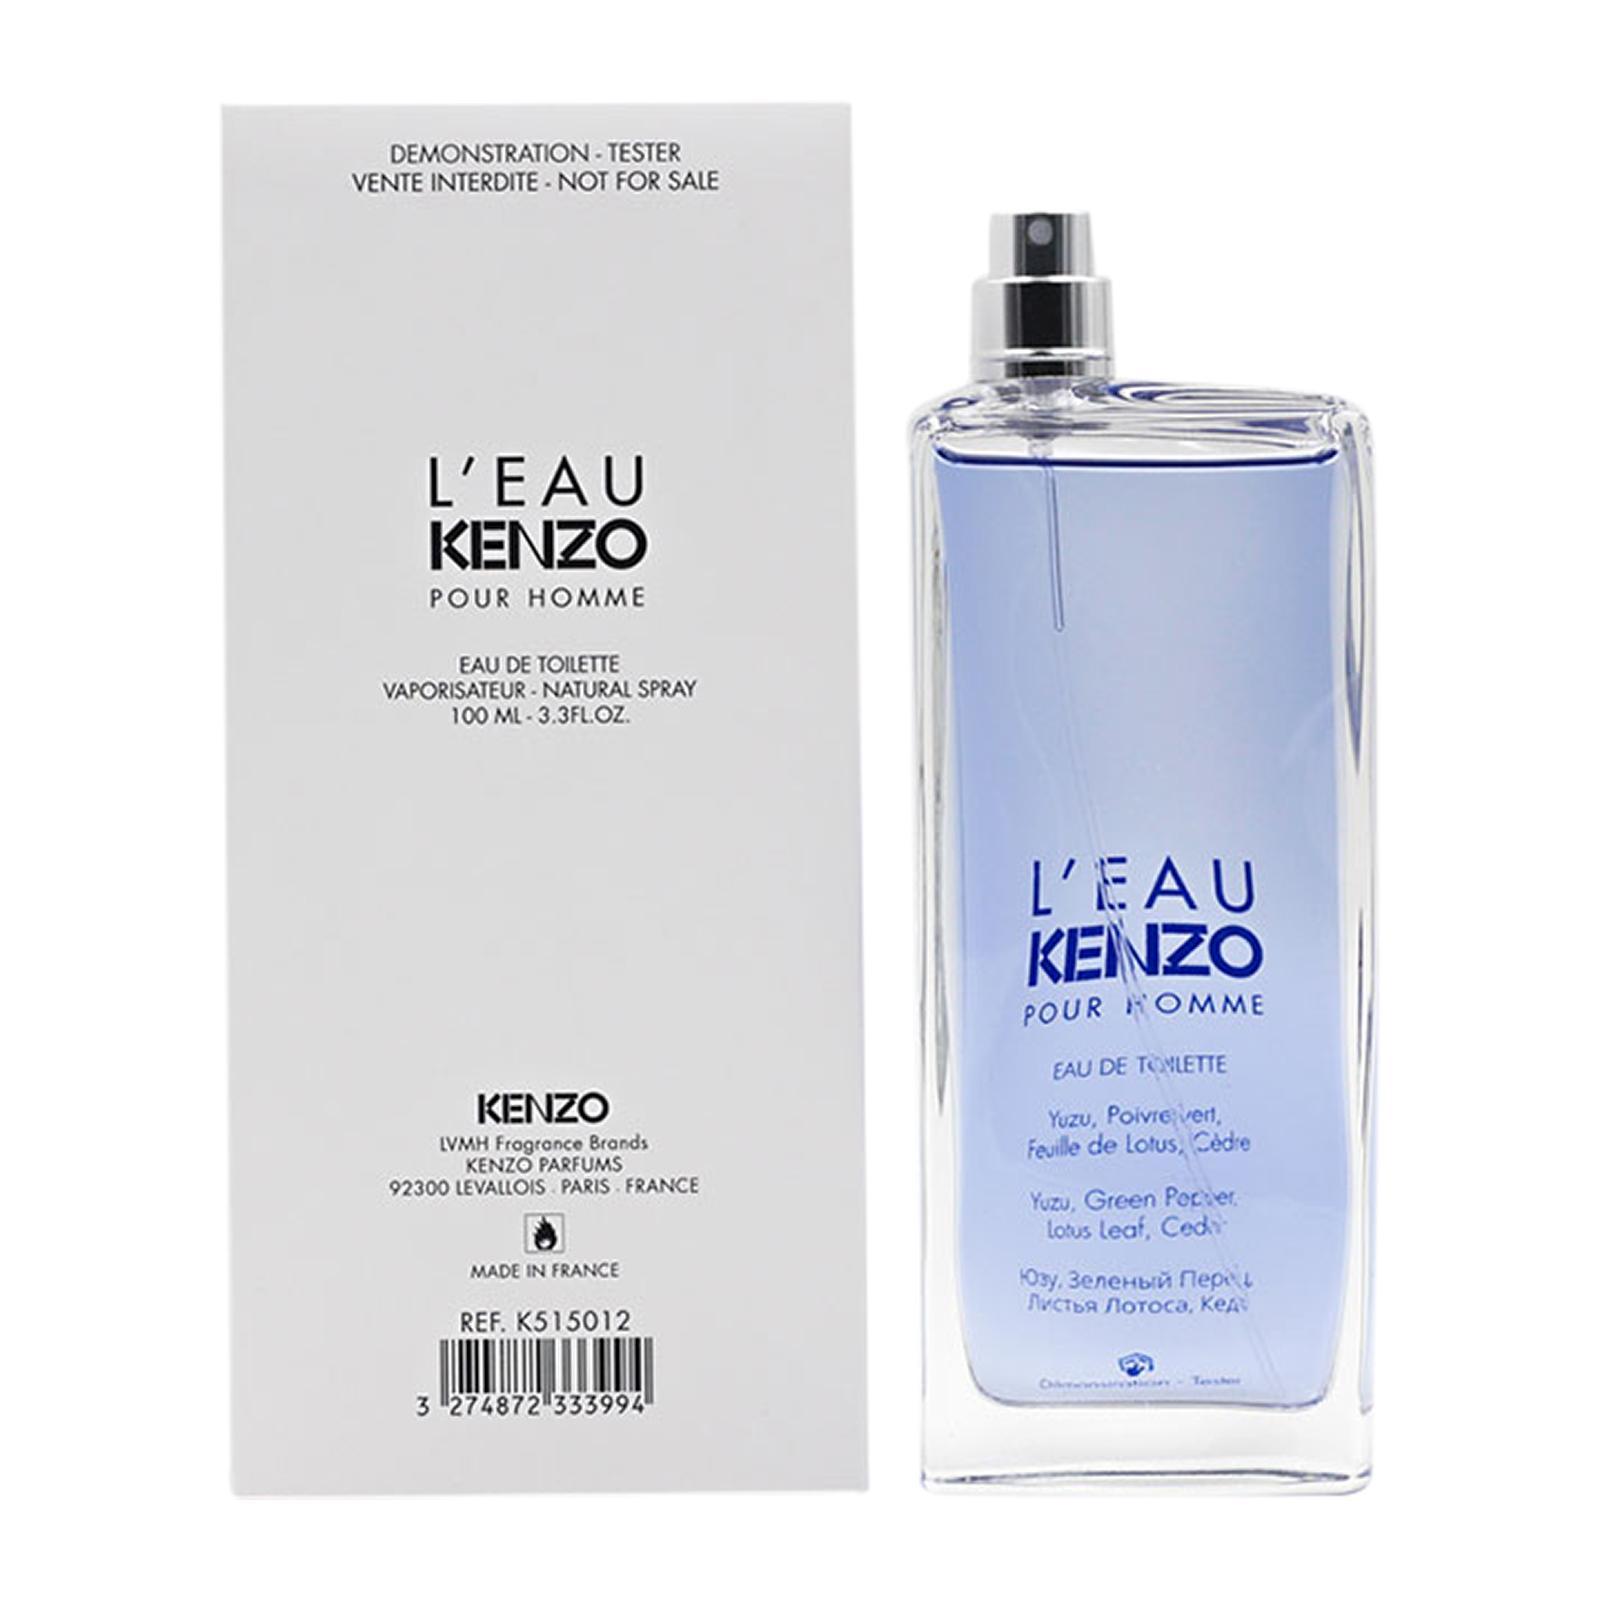 Kenzo L´eau Kenzo Pour Homme, 100ml, Toaletní voda - Tester